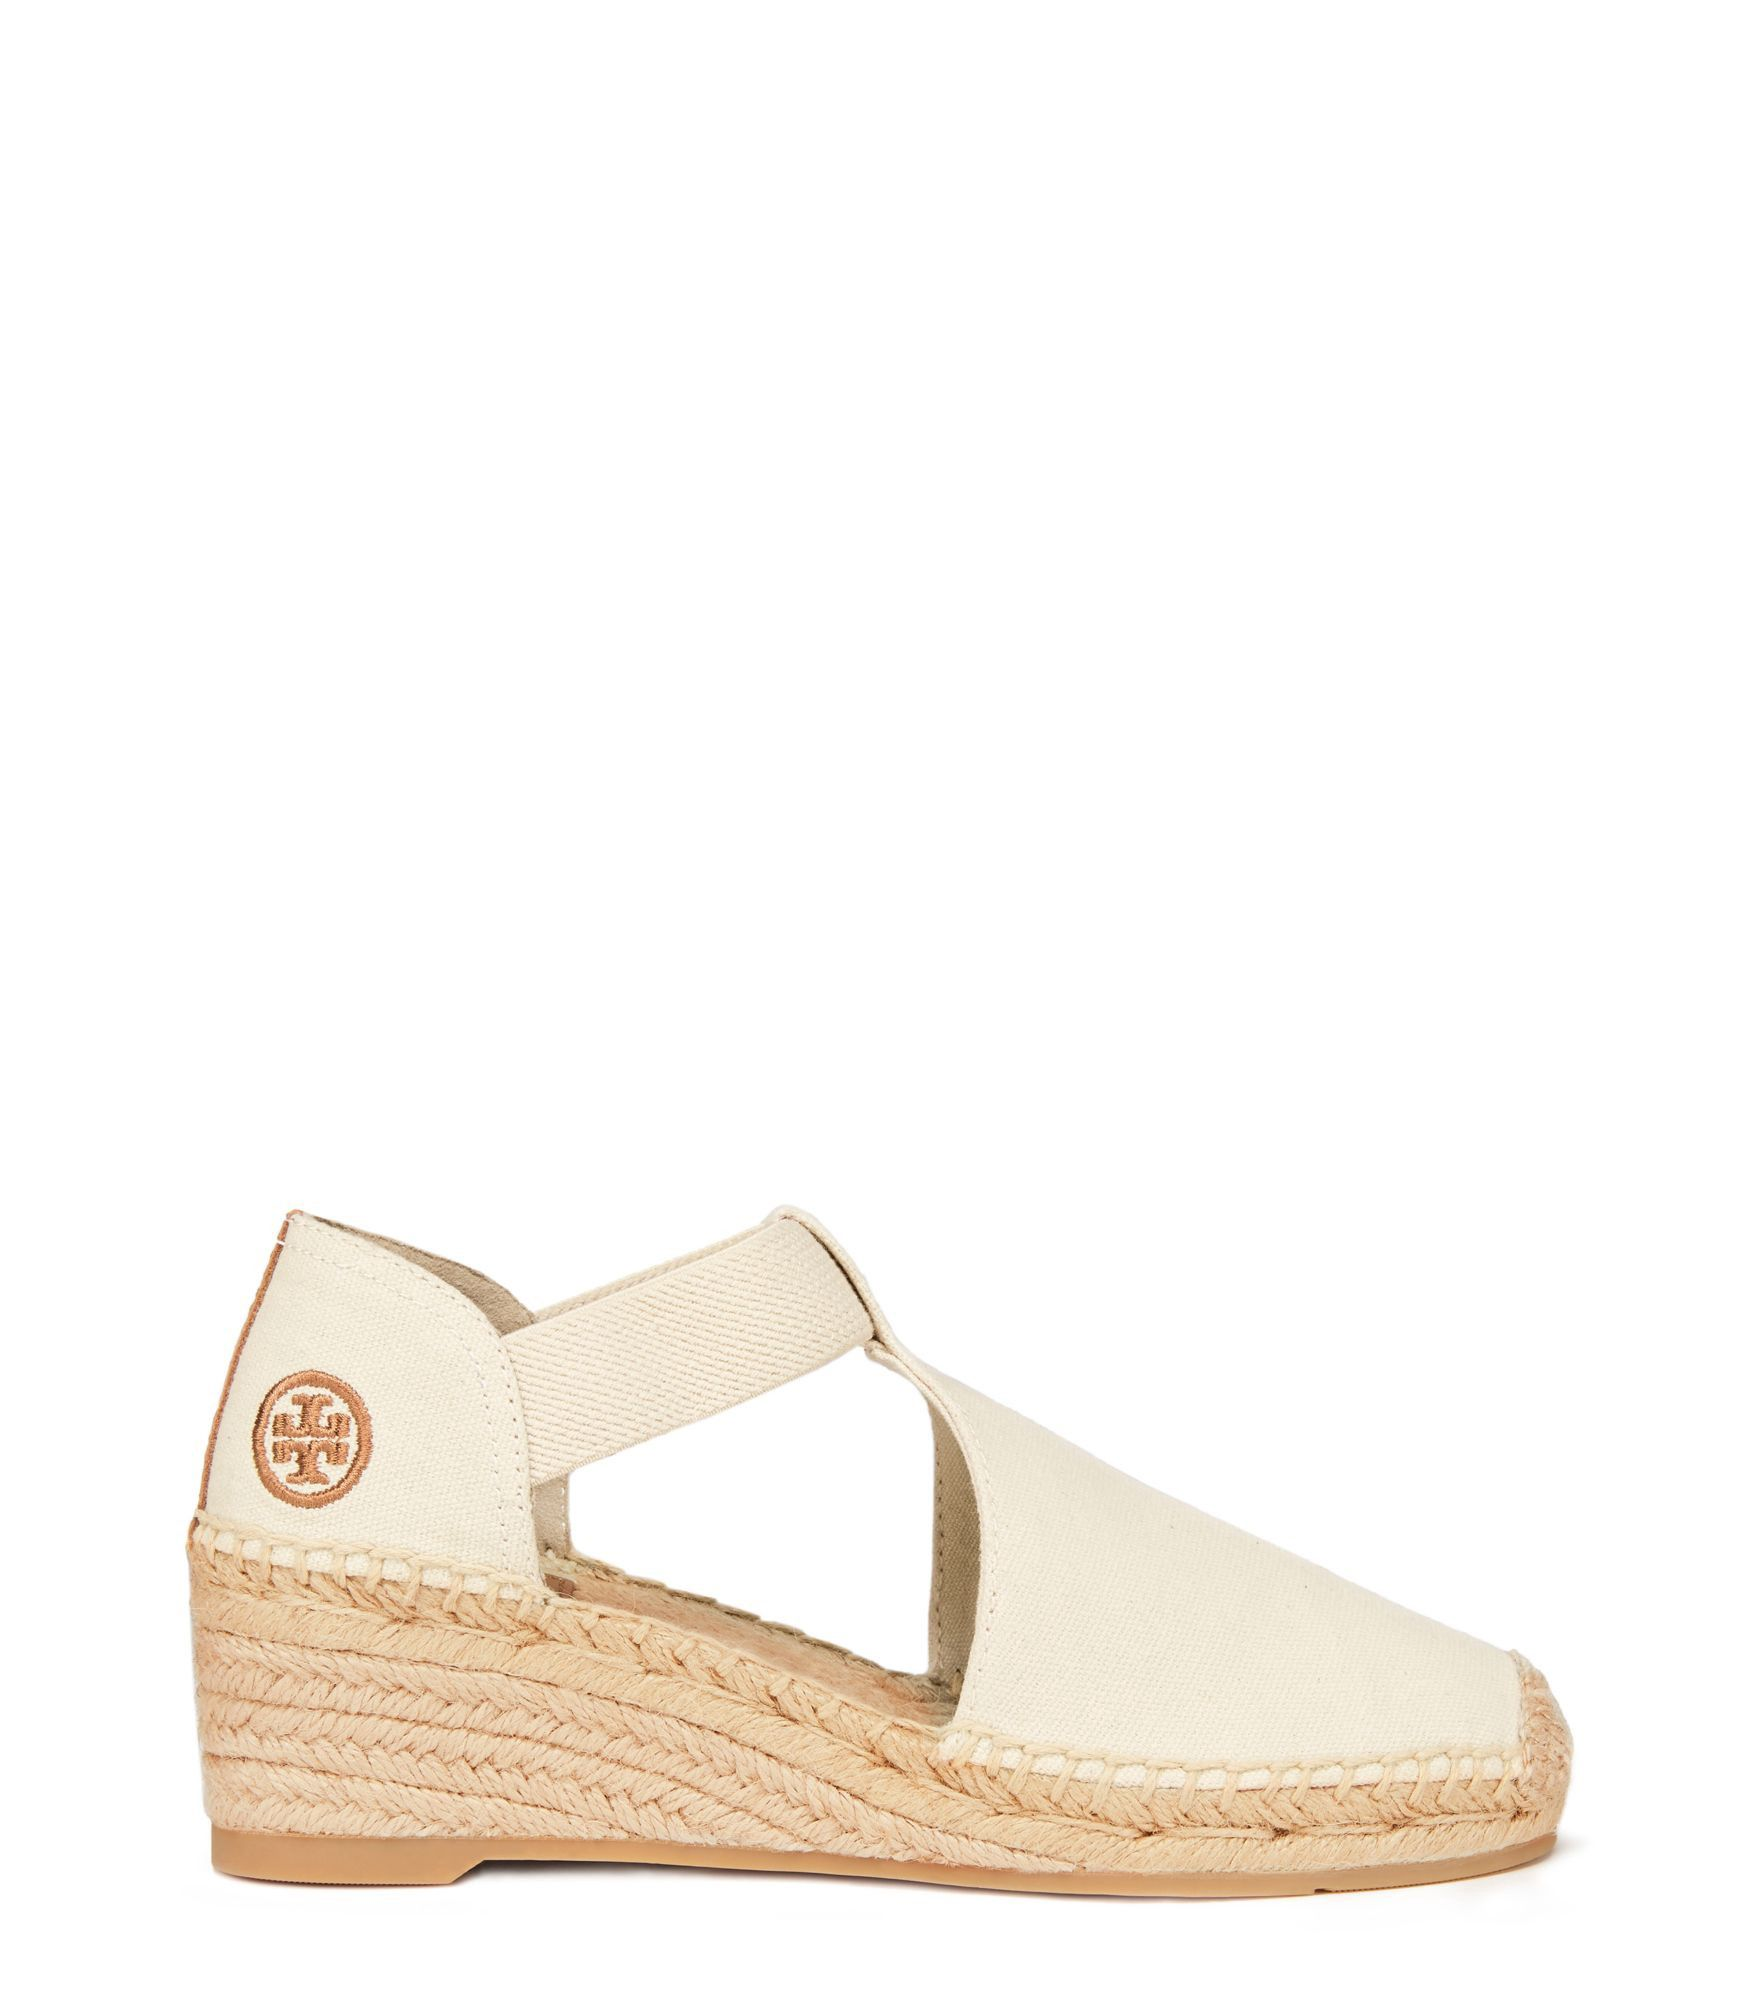 TORY BURCH CATALINA ESPADRILLE WEDGE SANDAL. #toryburch #shoes #all.  Alpargata ...